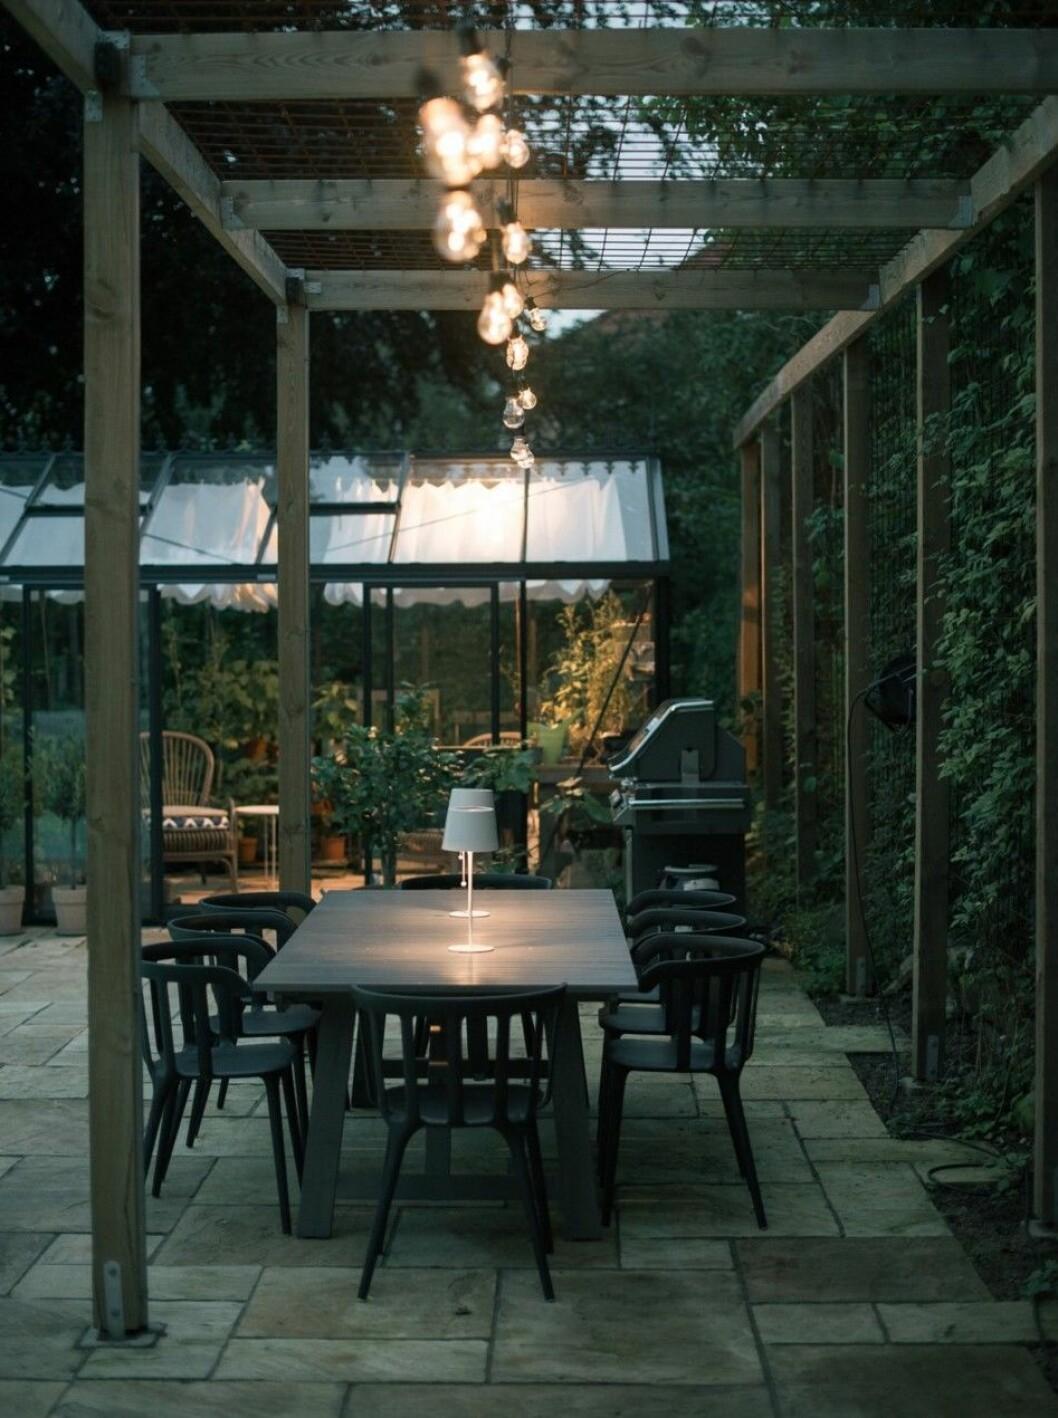 Kika in i arkitektritade 40-talsvillan.